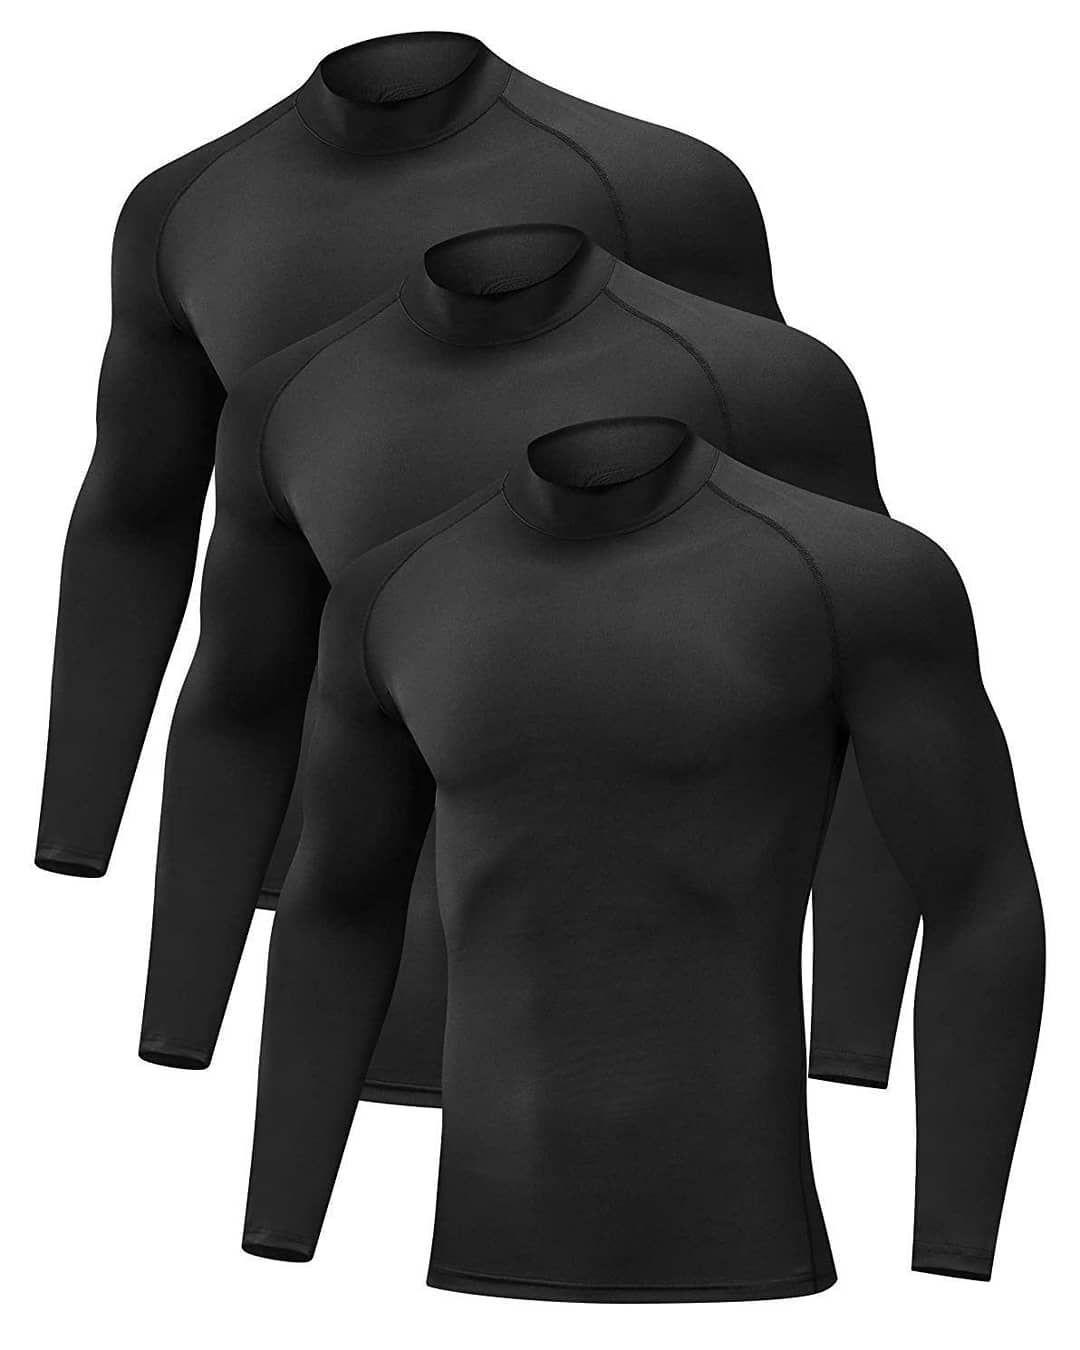 #fitnesswear #gymwear#gymgear #compressionwear#joggers #joggerpants #leggings#sportsbra#gymshort#scr...